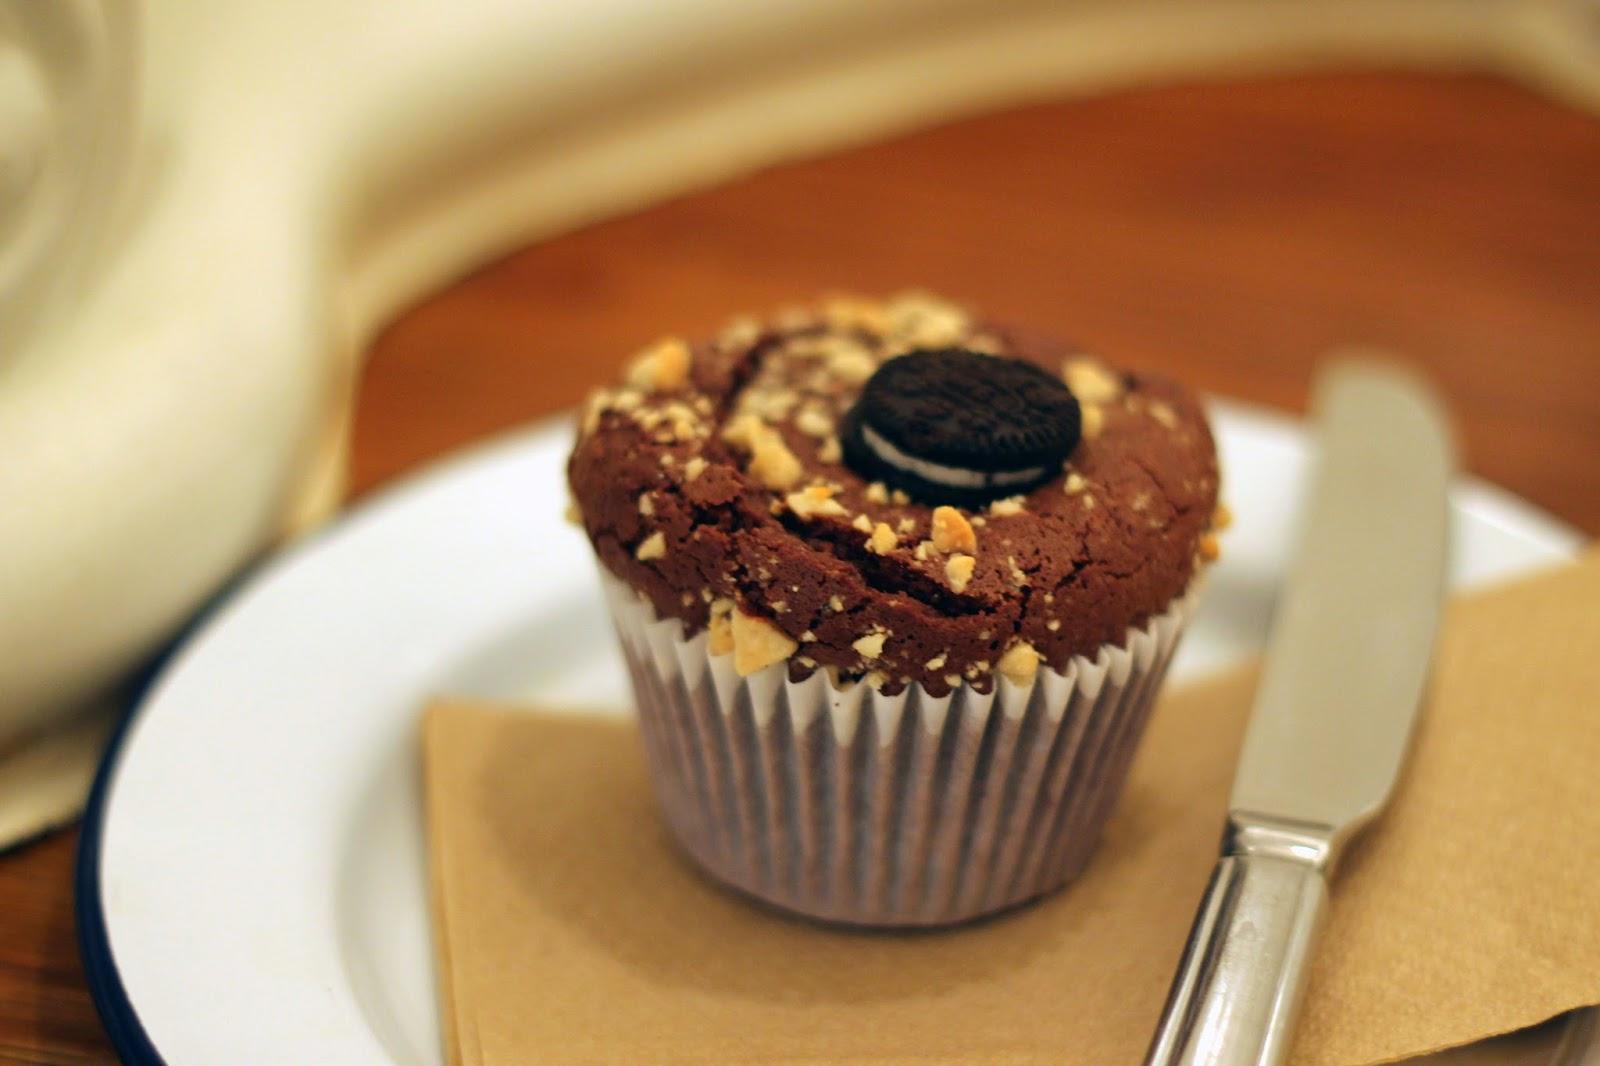 Oreo Peanutbutter Cupcake Attendant Food Cupcake Best cupcake cake peanut butter oreos oreo